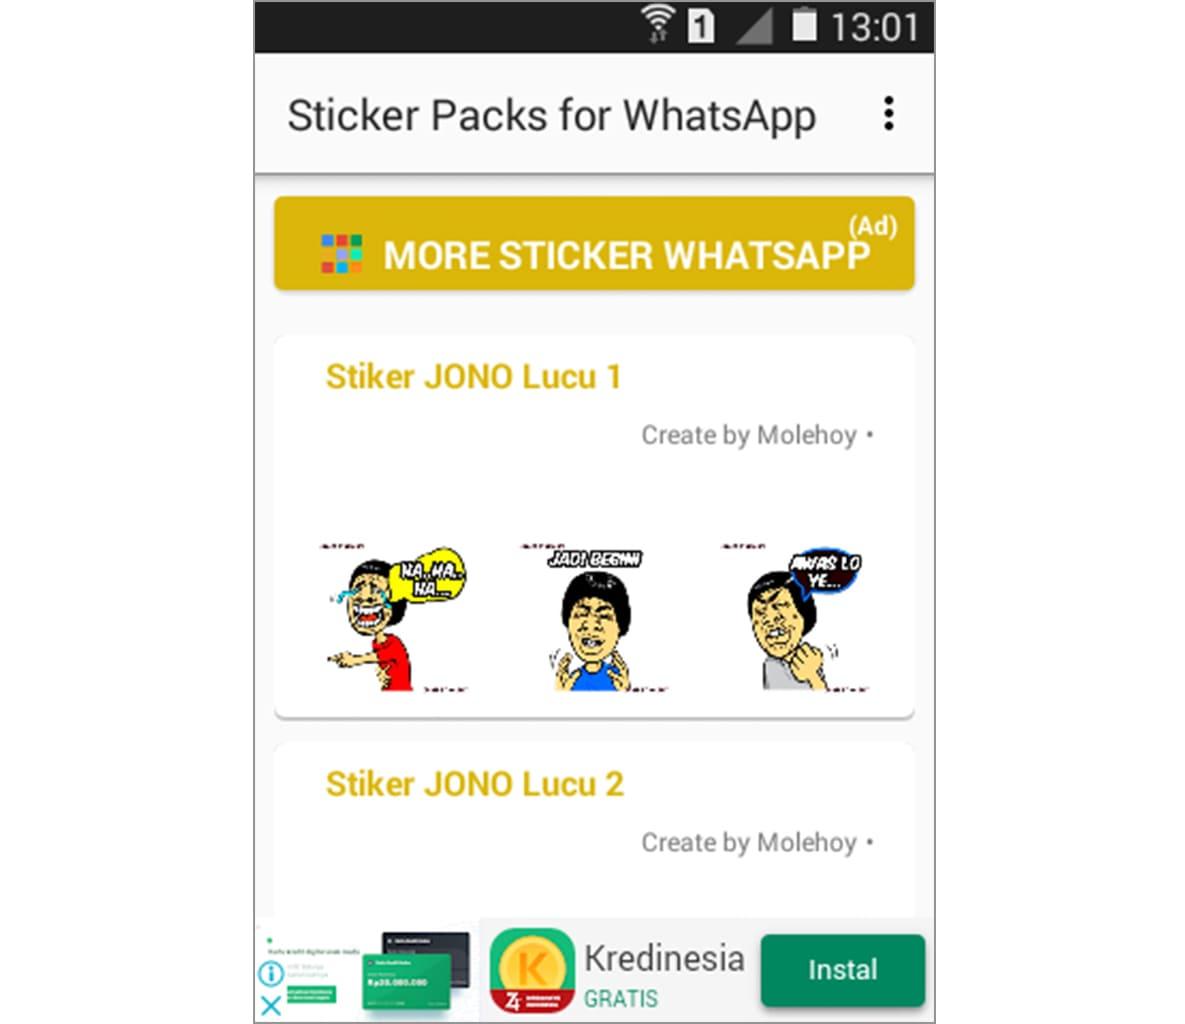 menambahkan stiker baru whatsapp